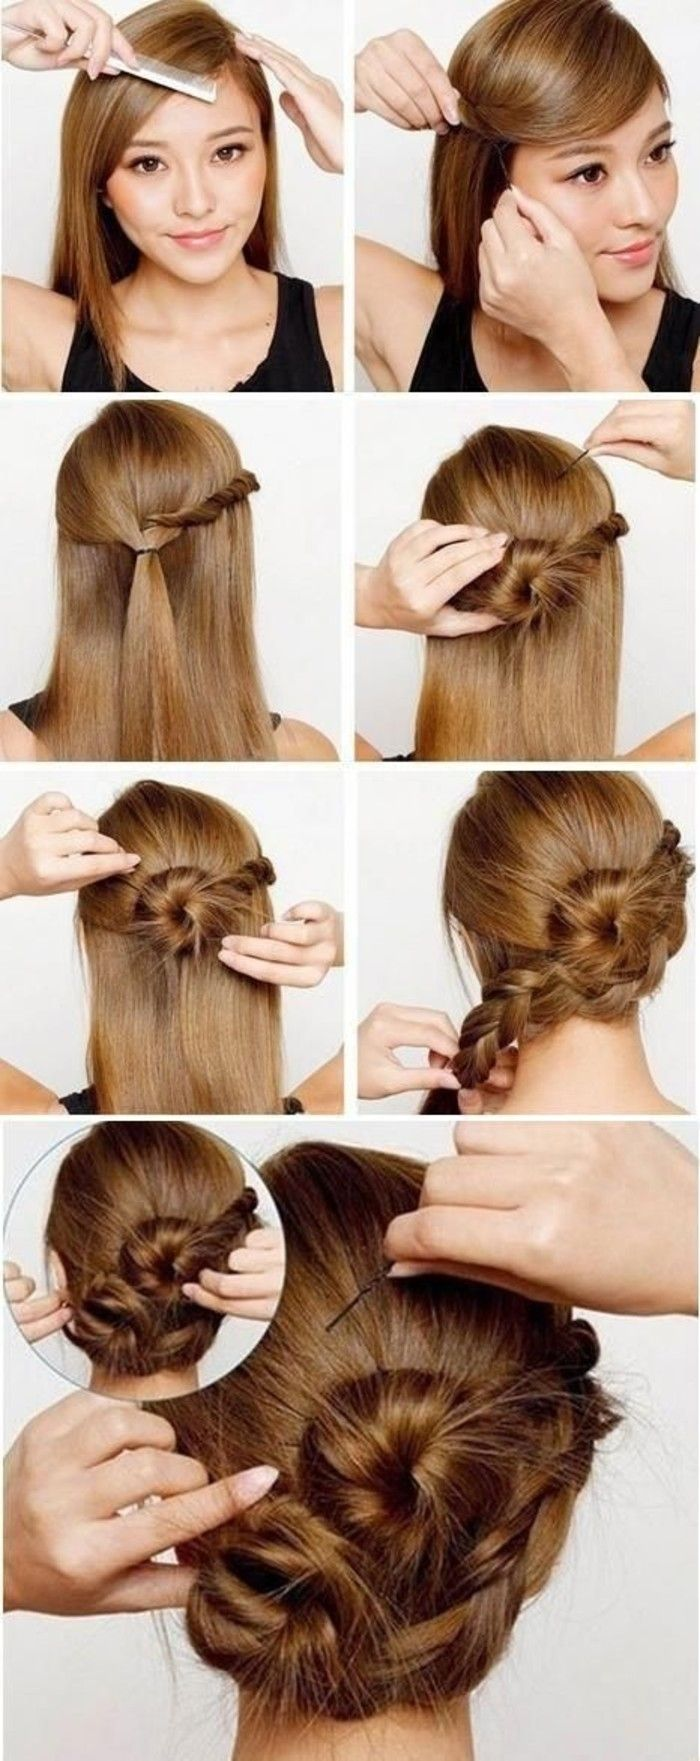 2016 Summer Braided Hairstyles Tutorial Hairplusbase Hair Trends